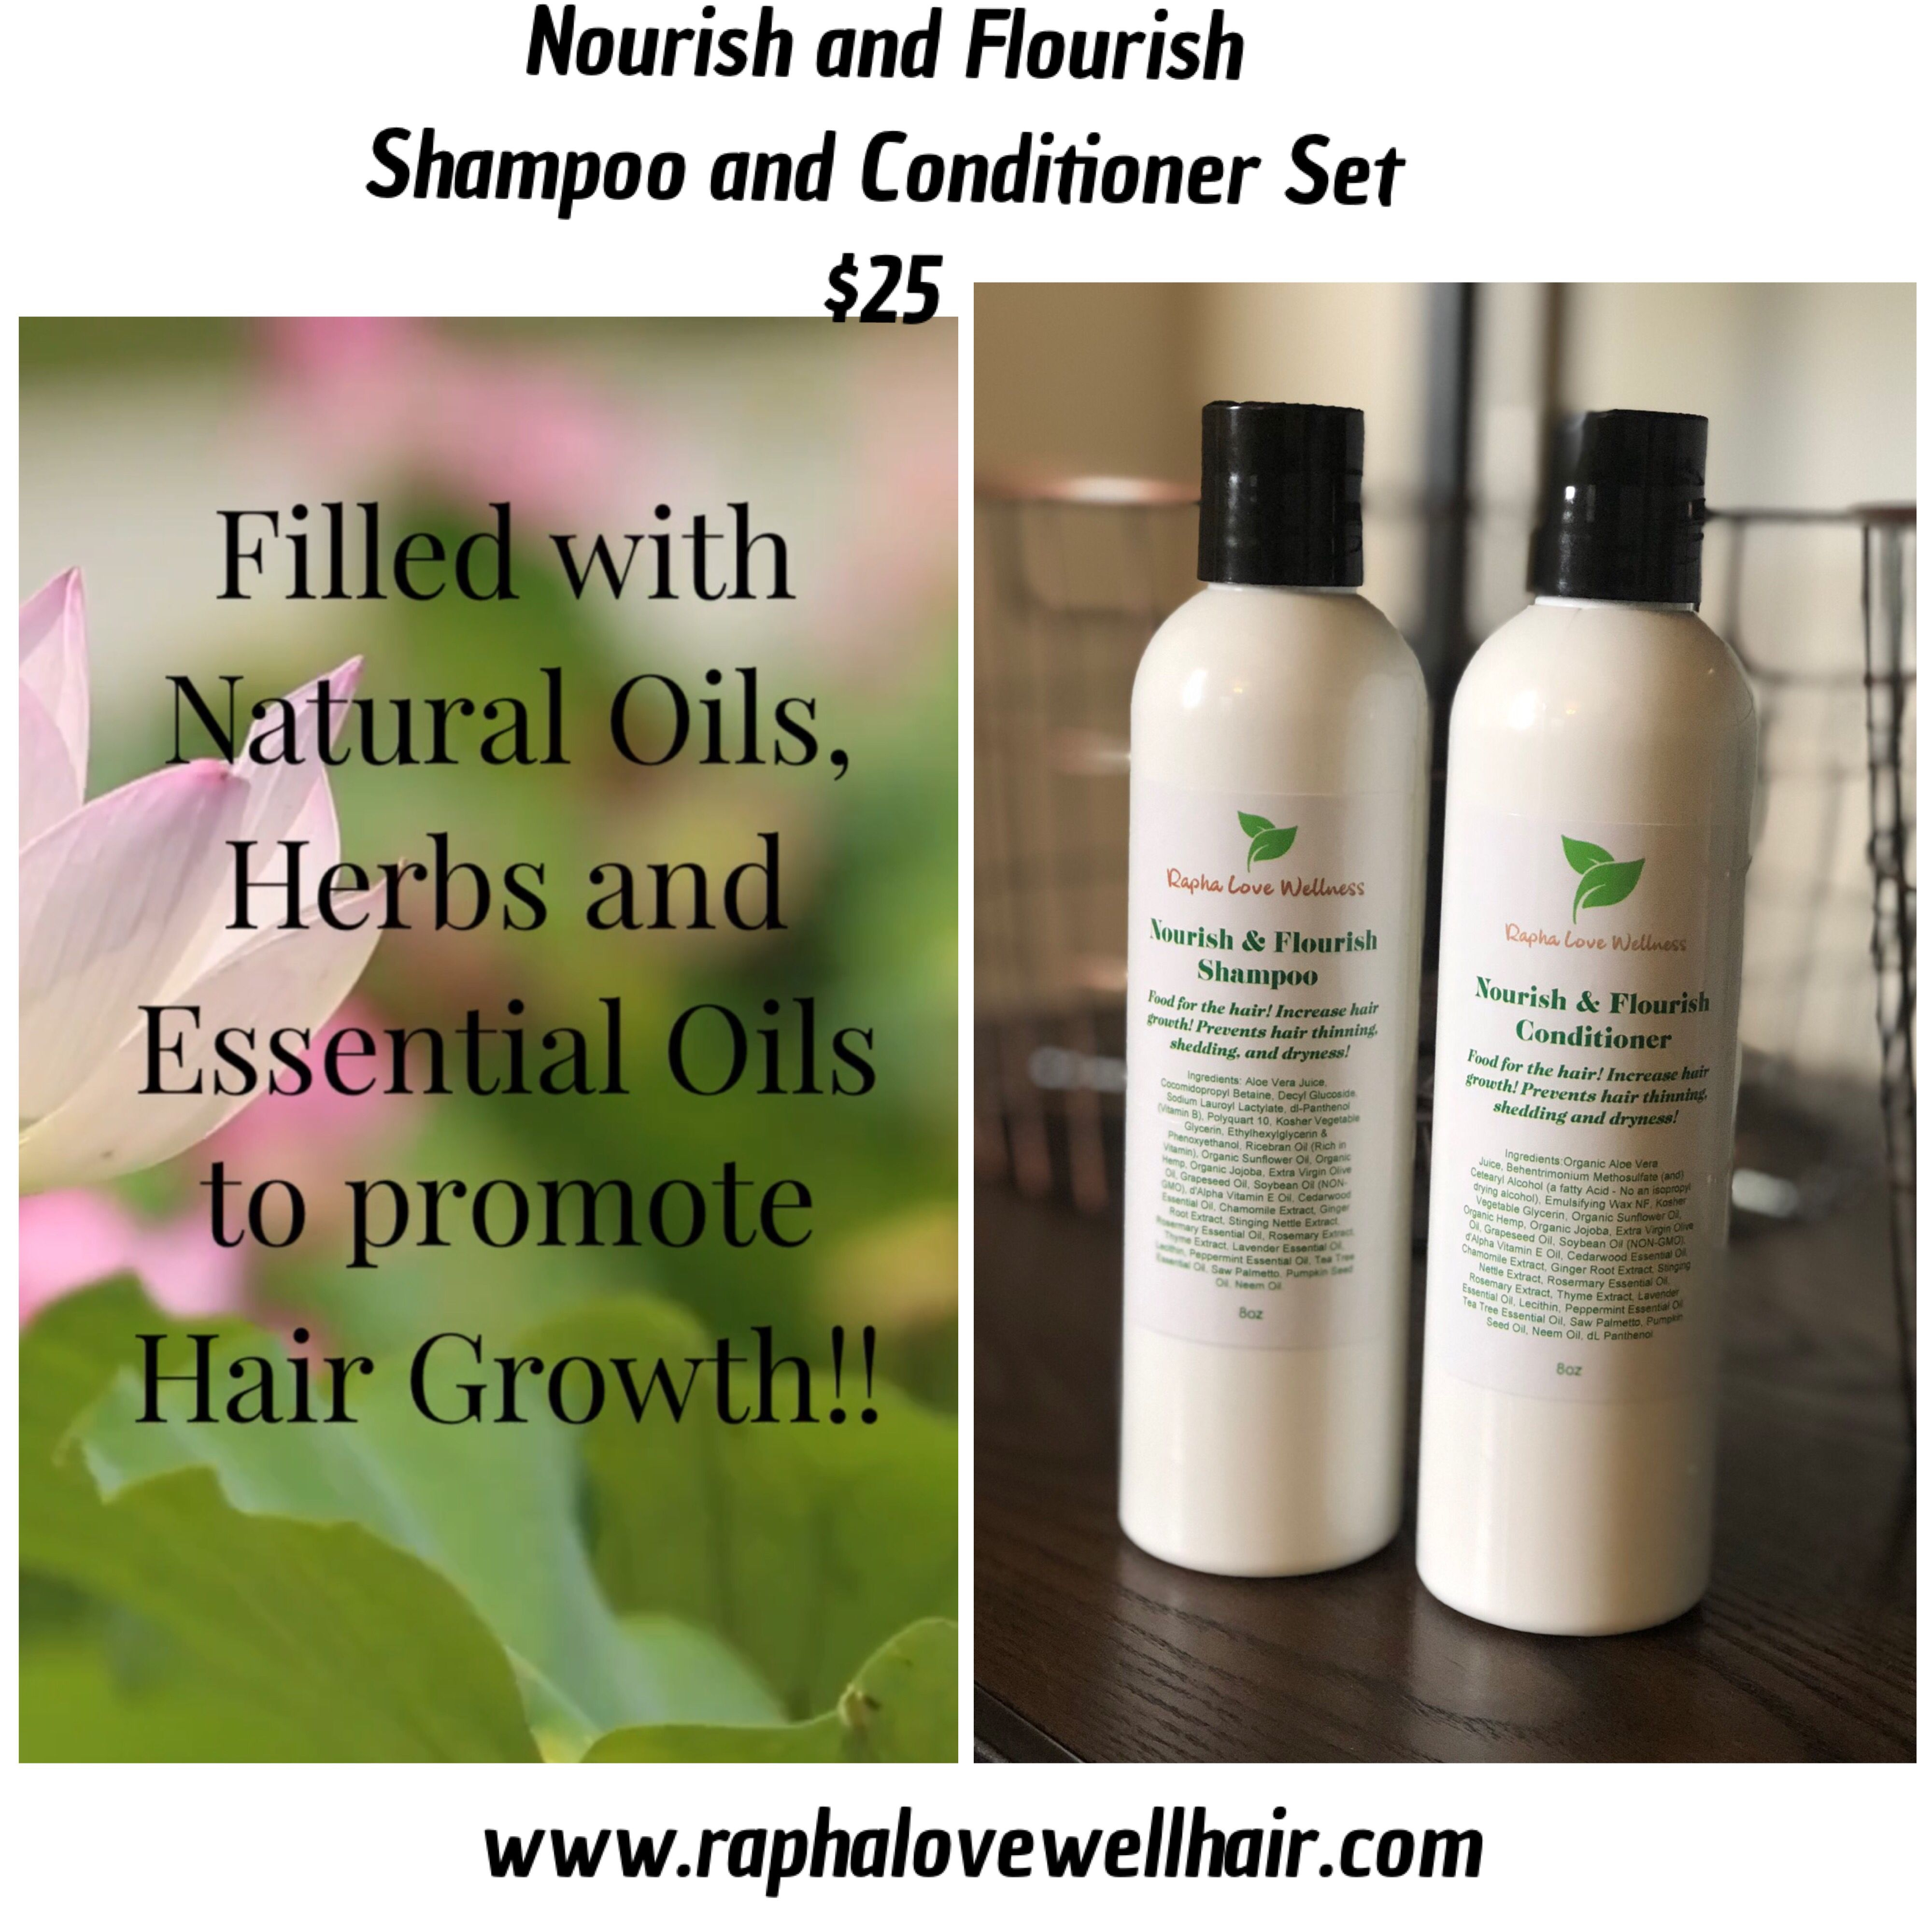 e96cada71e4f Rapha Love Wellness Nourish and Flourish Shampoo and Conditioner ...